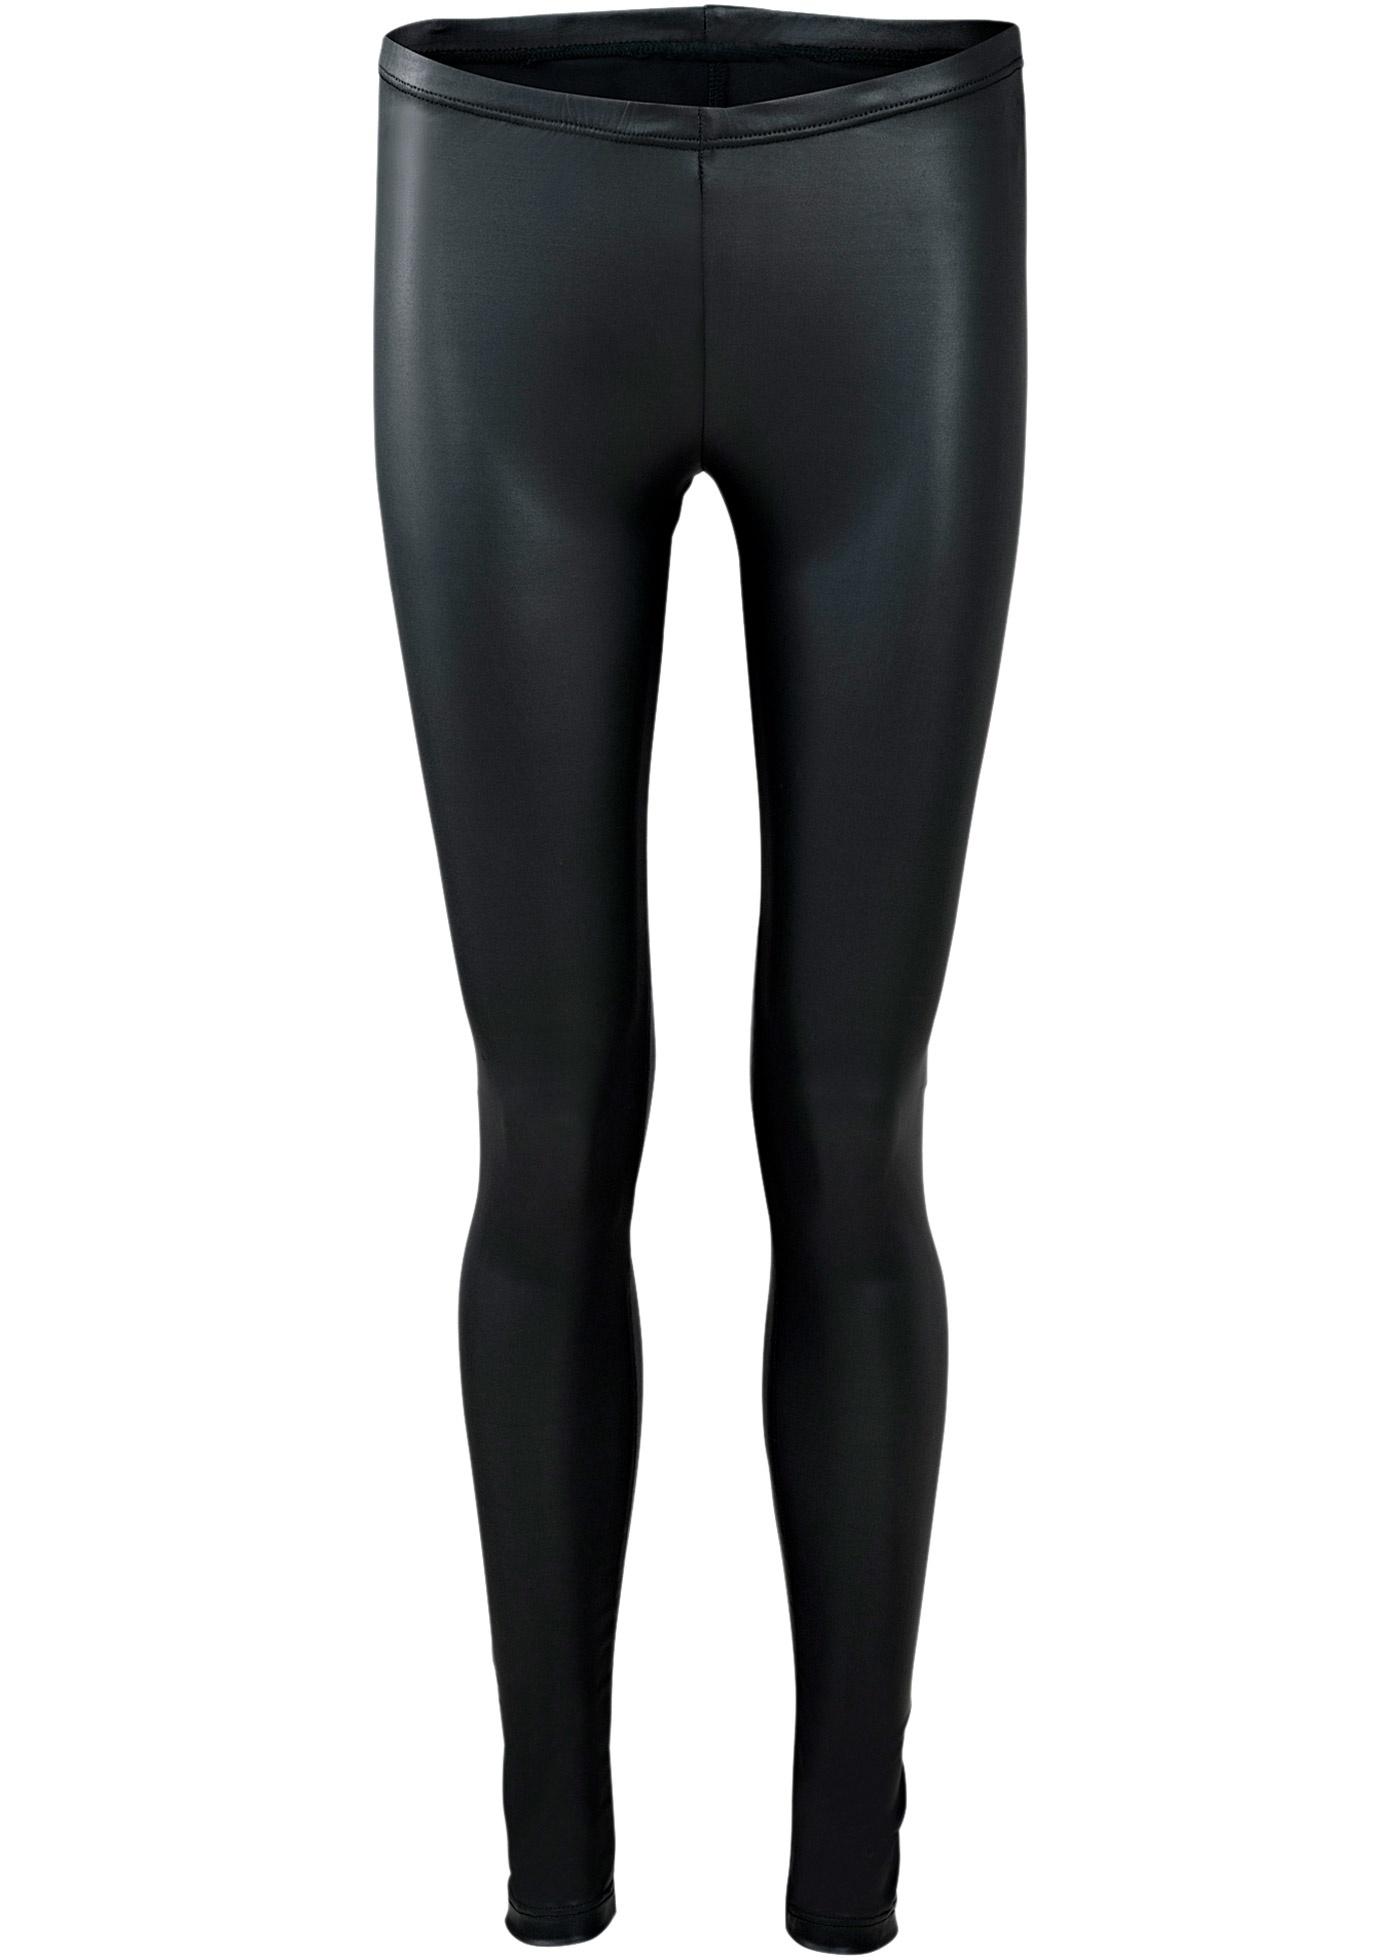 Pour Femme Enduit Noir Bodyflirt BonprixLegging eD9YWI2EHb